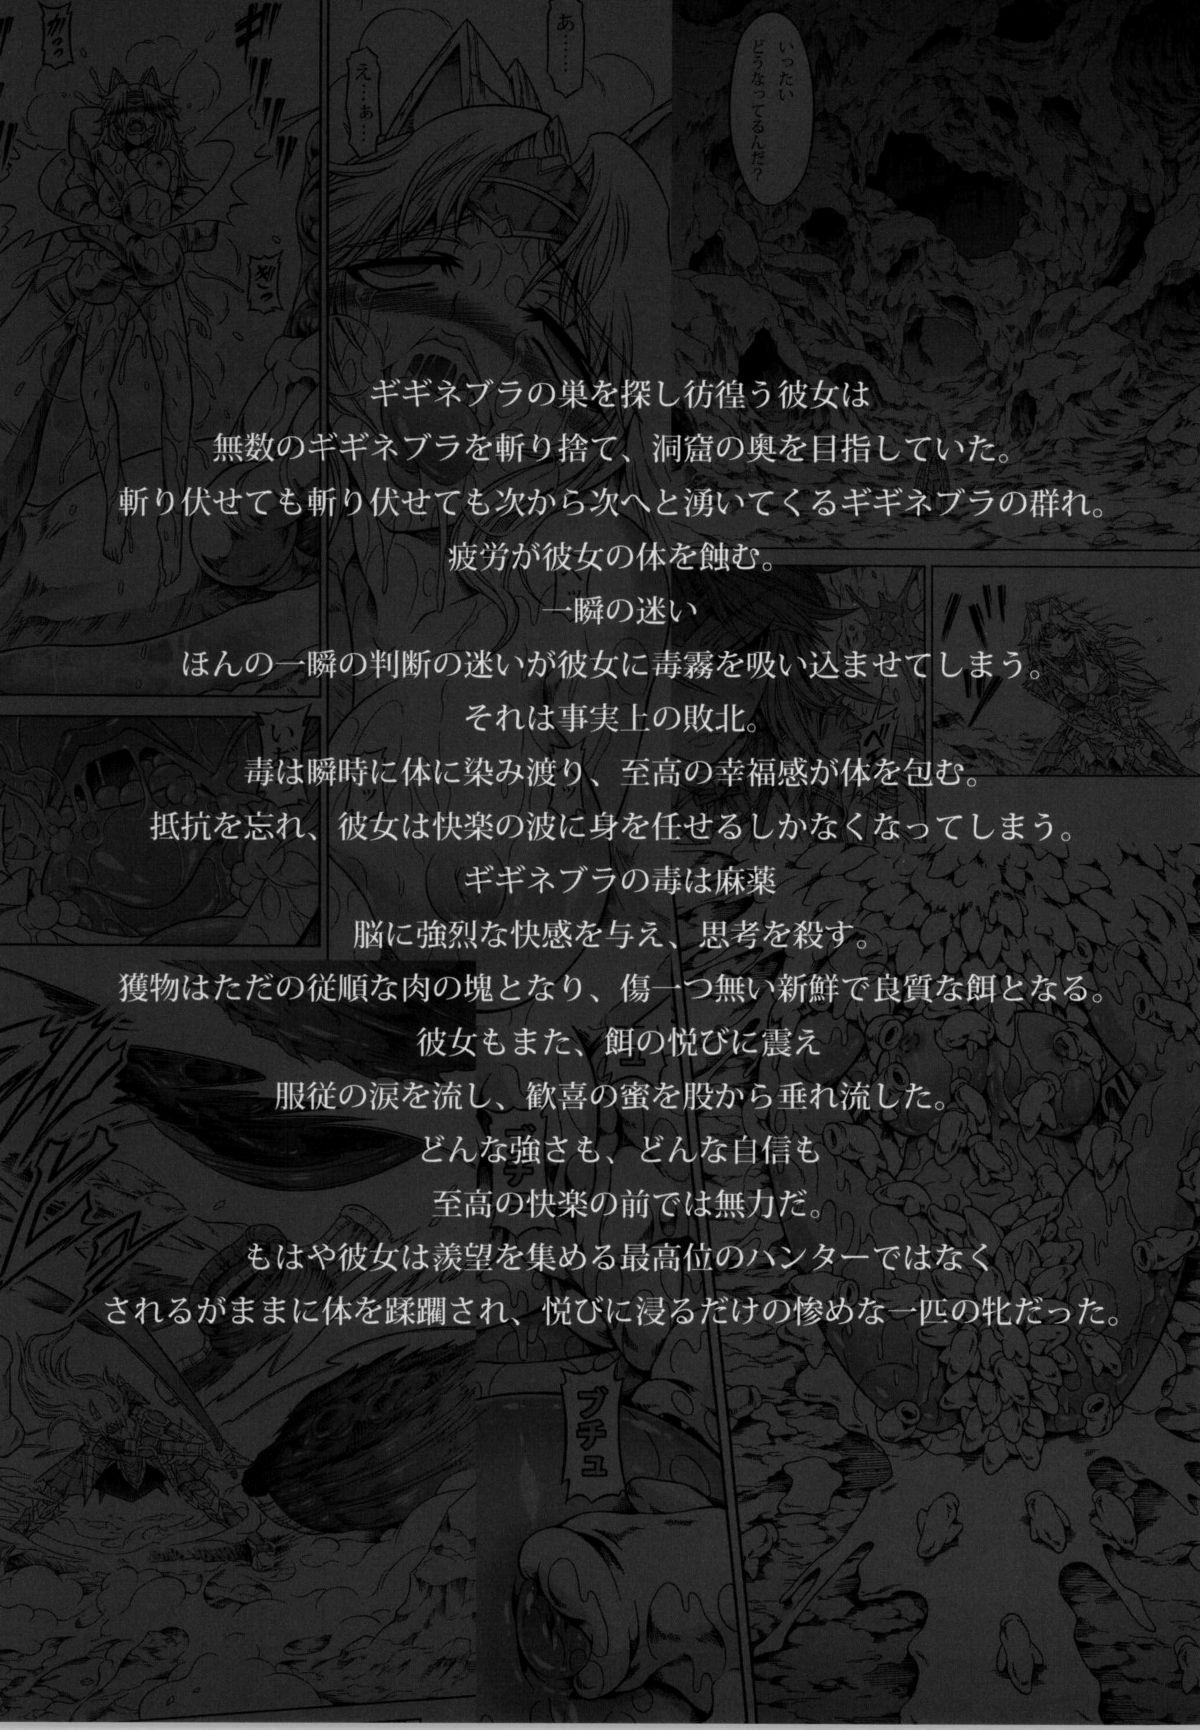 Solo Hunter no Seitai 4 The third part 4